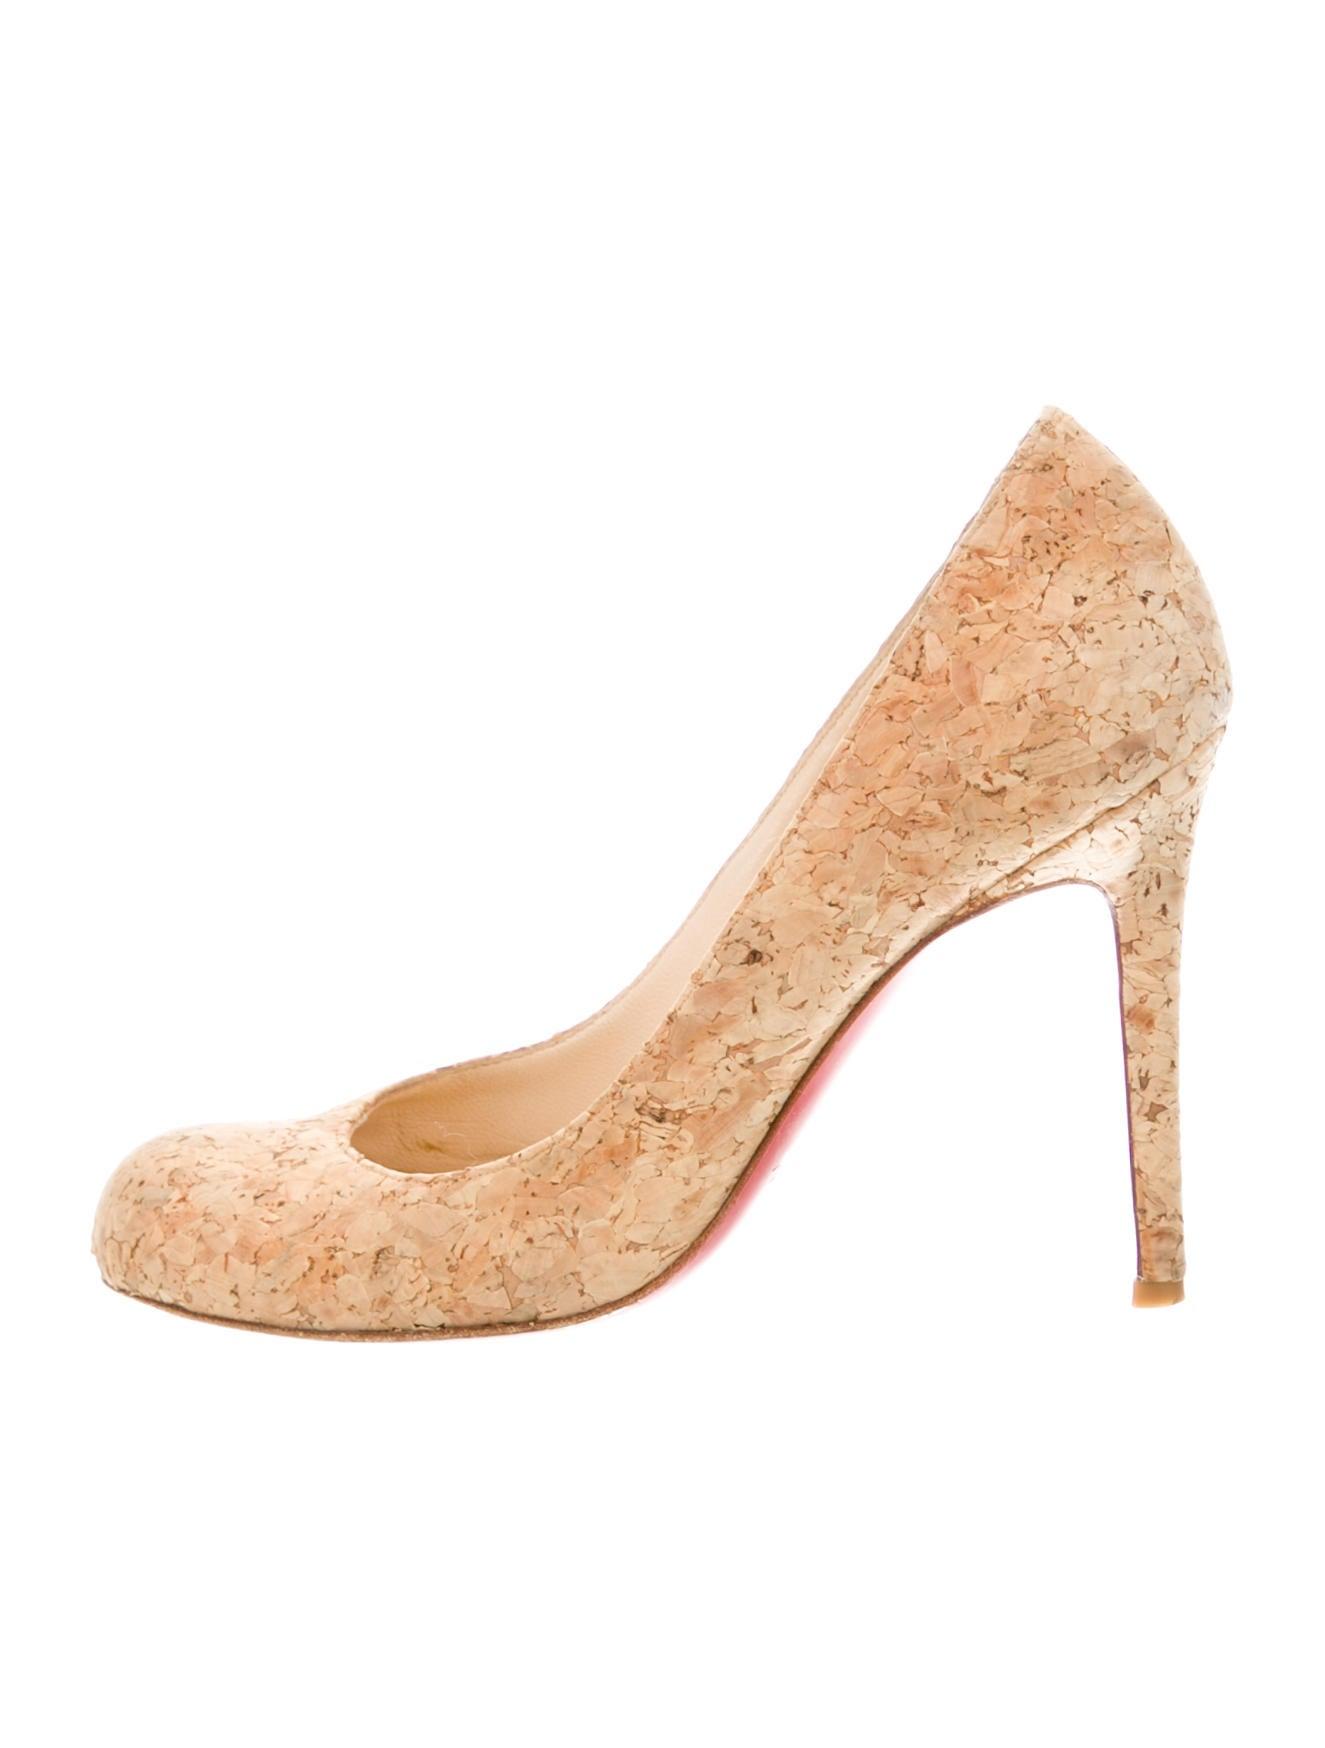 Christian louboutin cork simple pumps shoes cht71520 for Simple cork